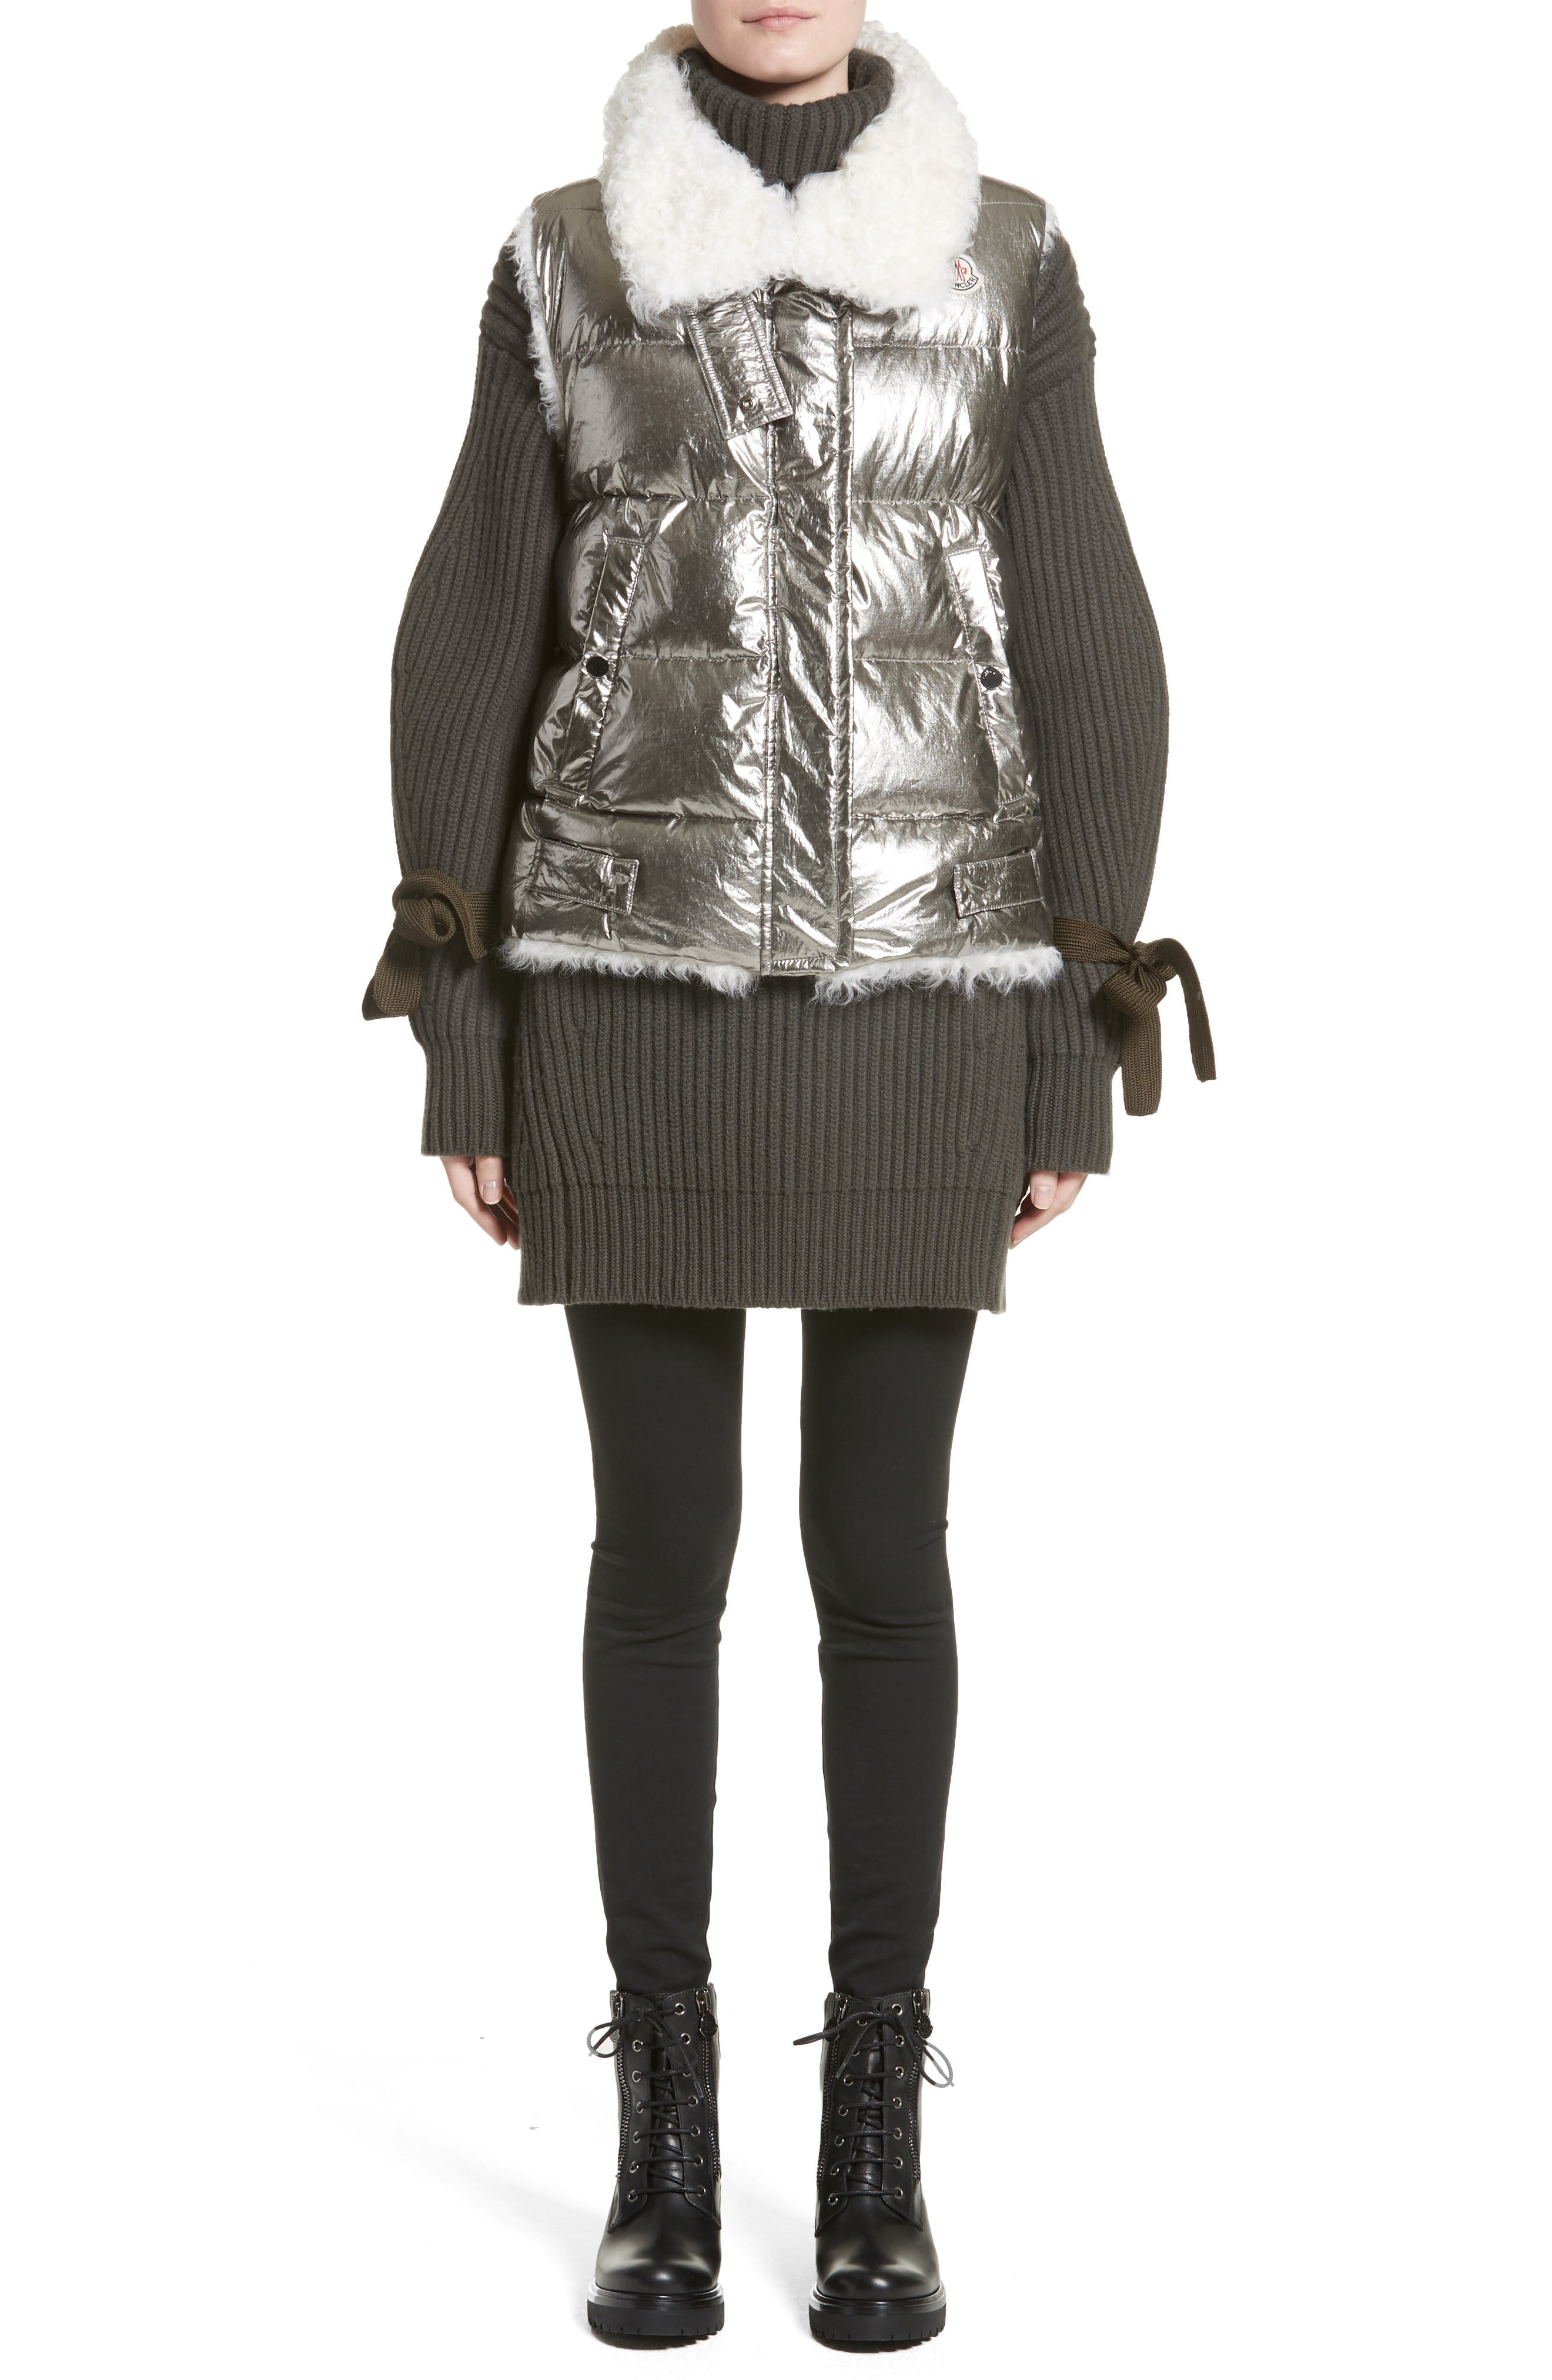 Kerria Metallic Down Vest with Genuine Shearling Trim,                             Alternate thumbnail 7, color,                             040